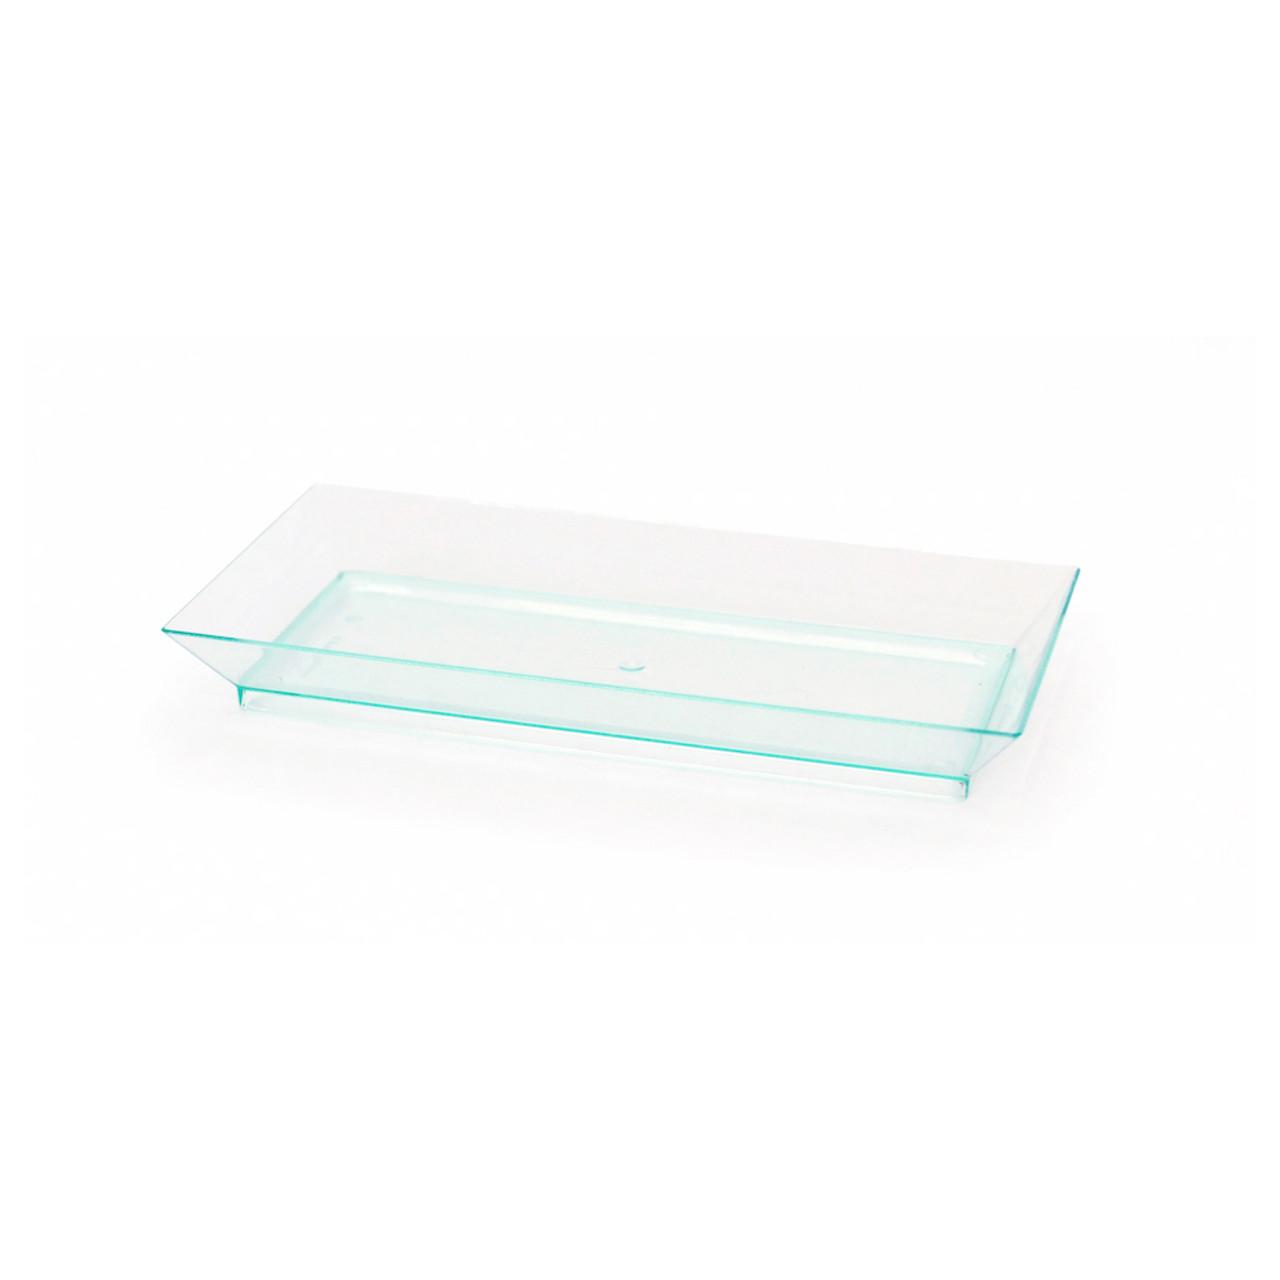 Klarity Rectangular Transparent Green Dish - L:5.1 x W:2.5 x H:.61in